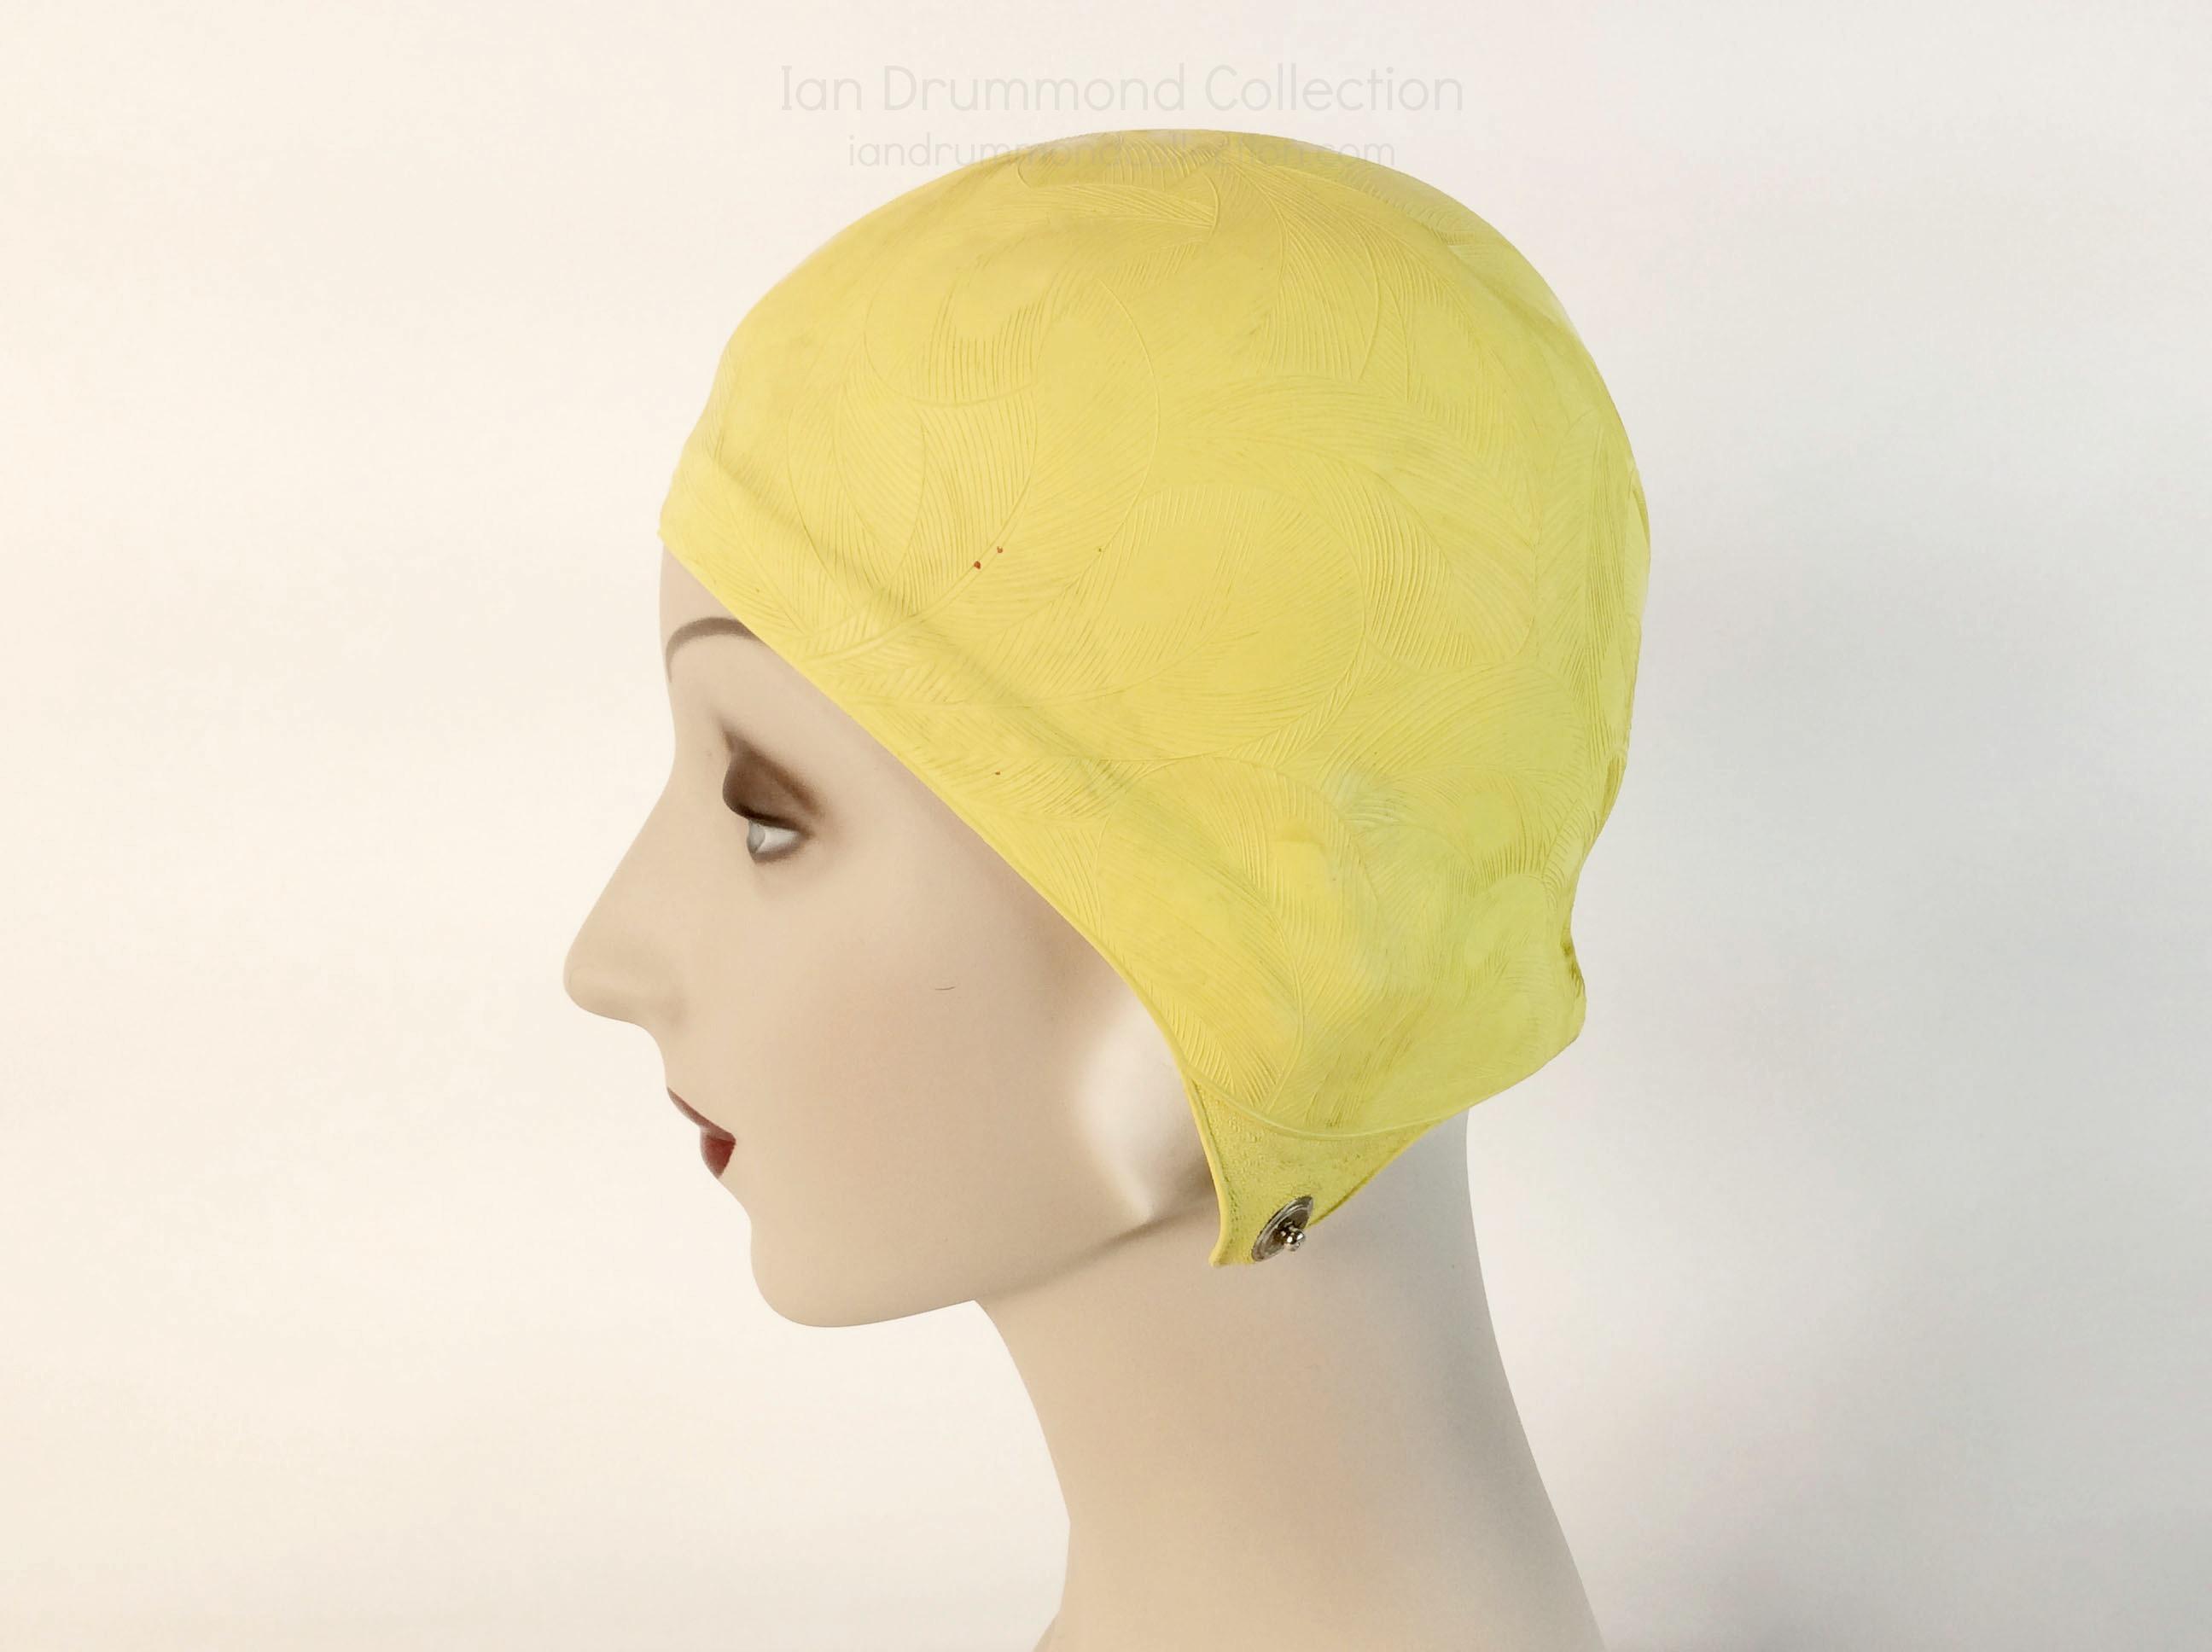 IDC Movie Wardrobe Rental Swim Cap 13 Yellow with Embossed Leaf Design